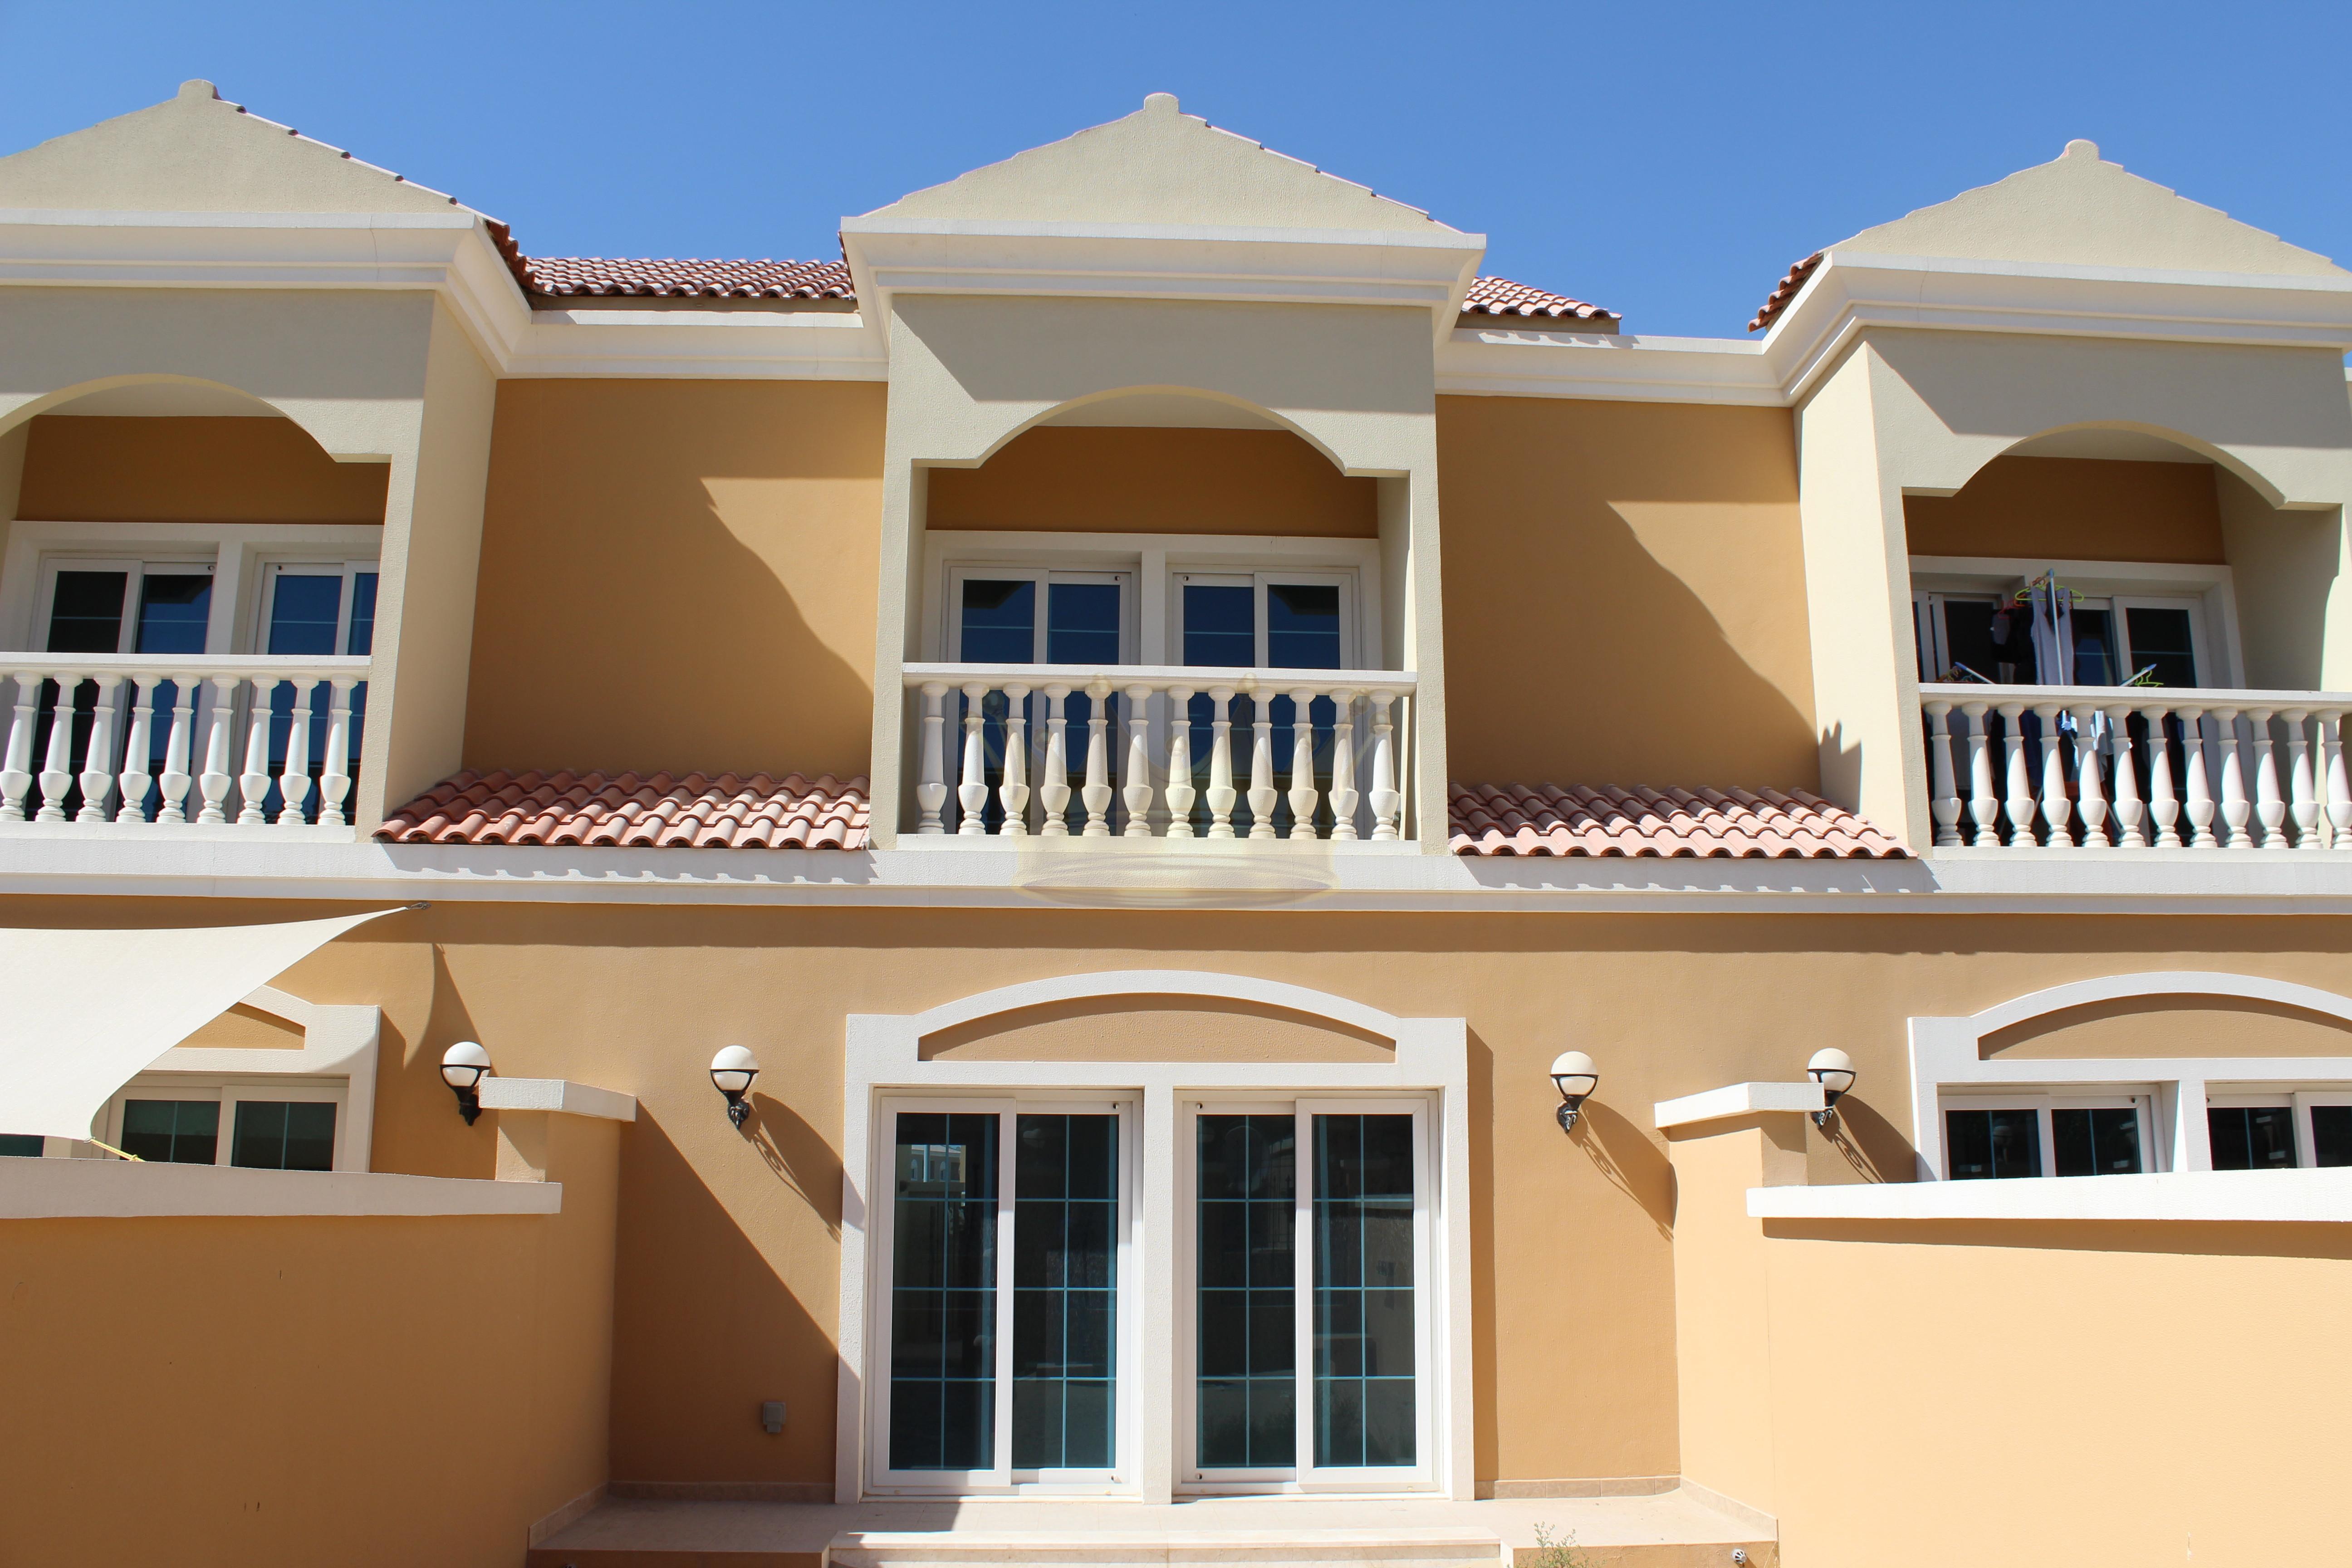 1 B/R Converted to 2 B/R Nakheel Townhouse